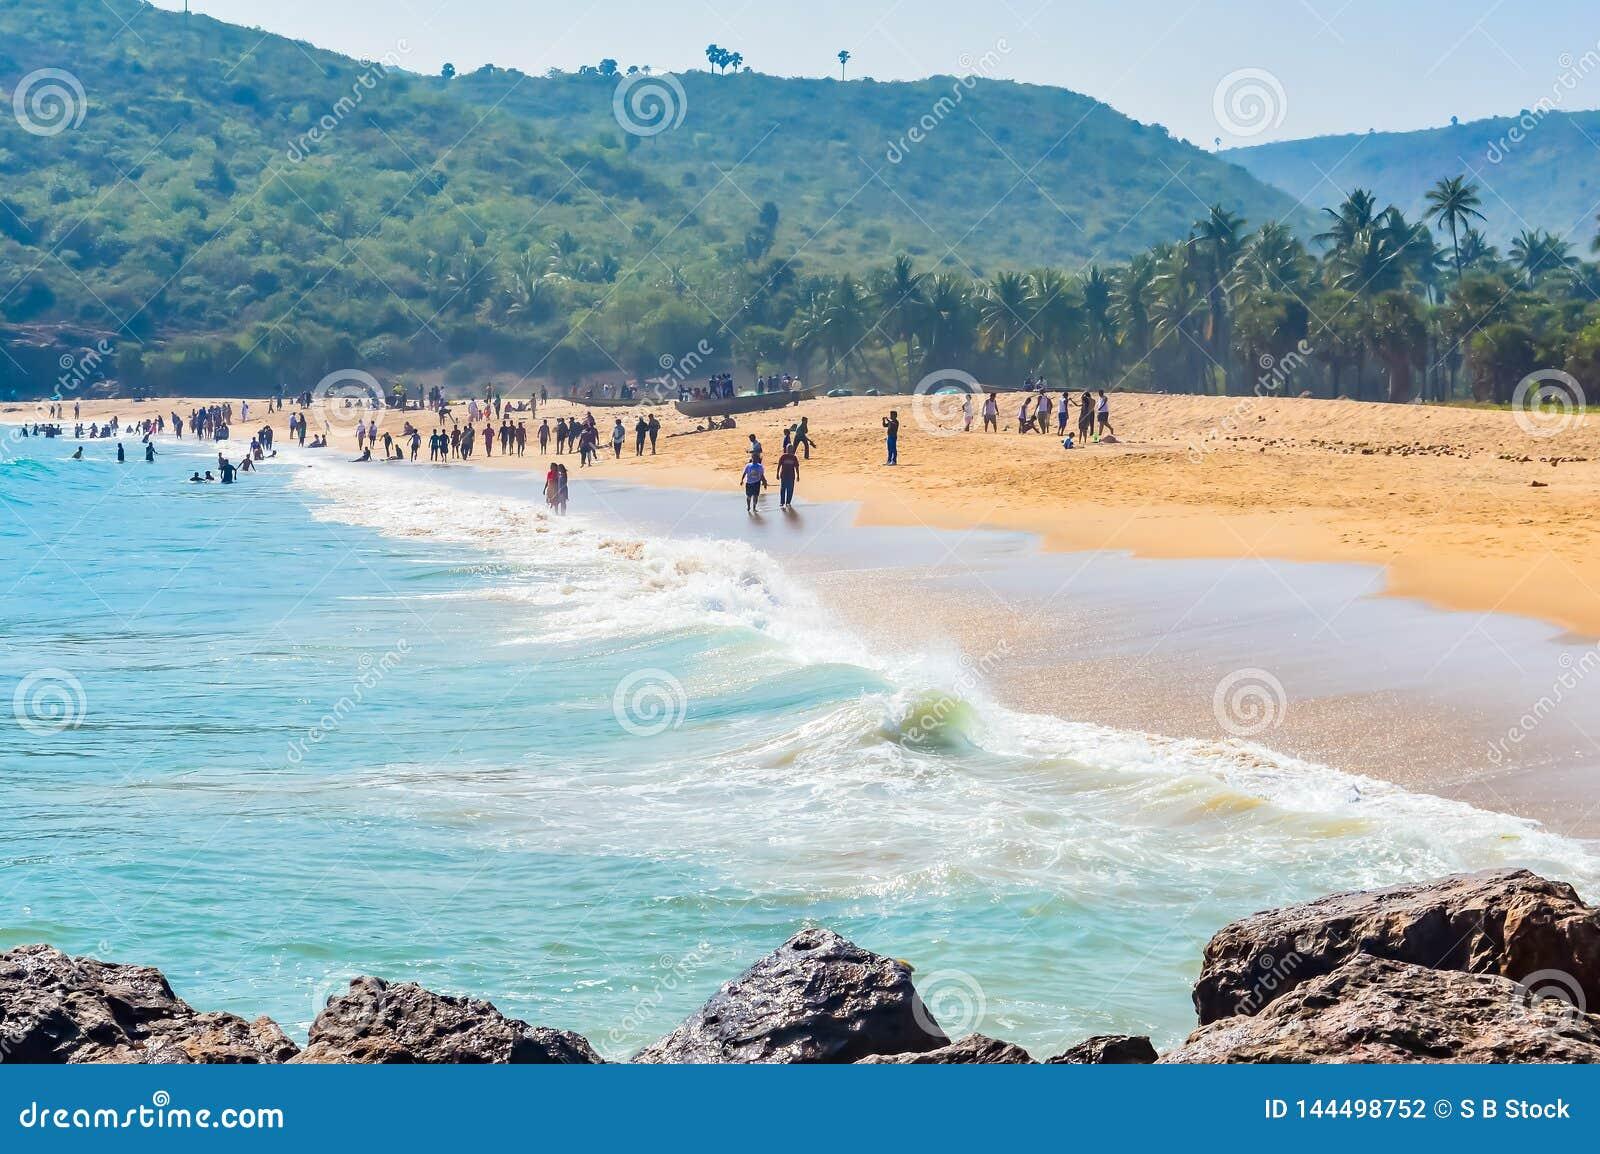 Yarada Beach, Visakhapatnam, India 10 December 2018 - People relaxing and enjoying in Yarada Beach. The Coast area is surrounded